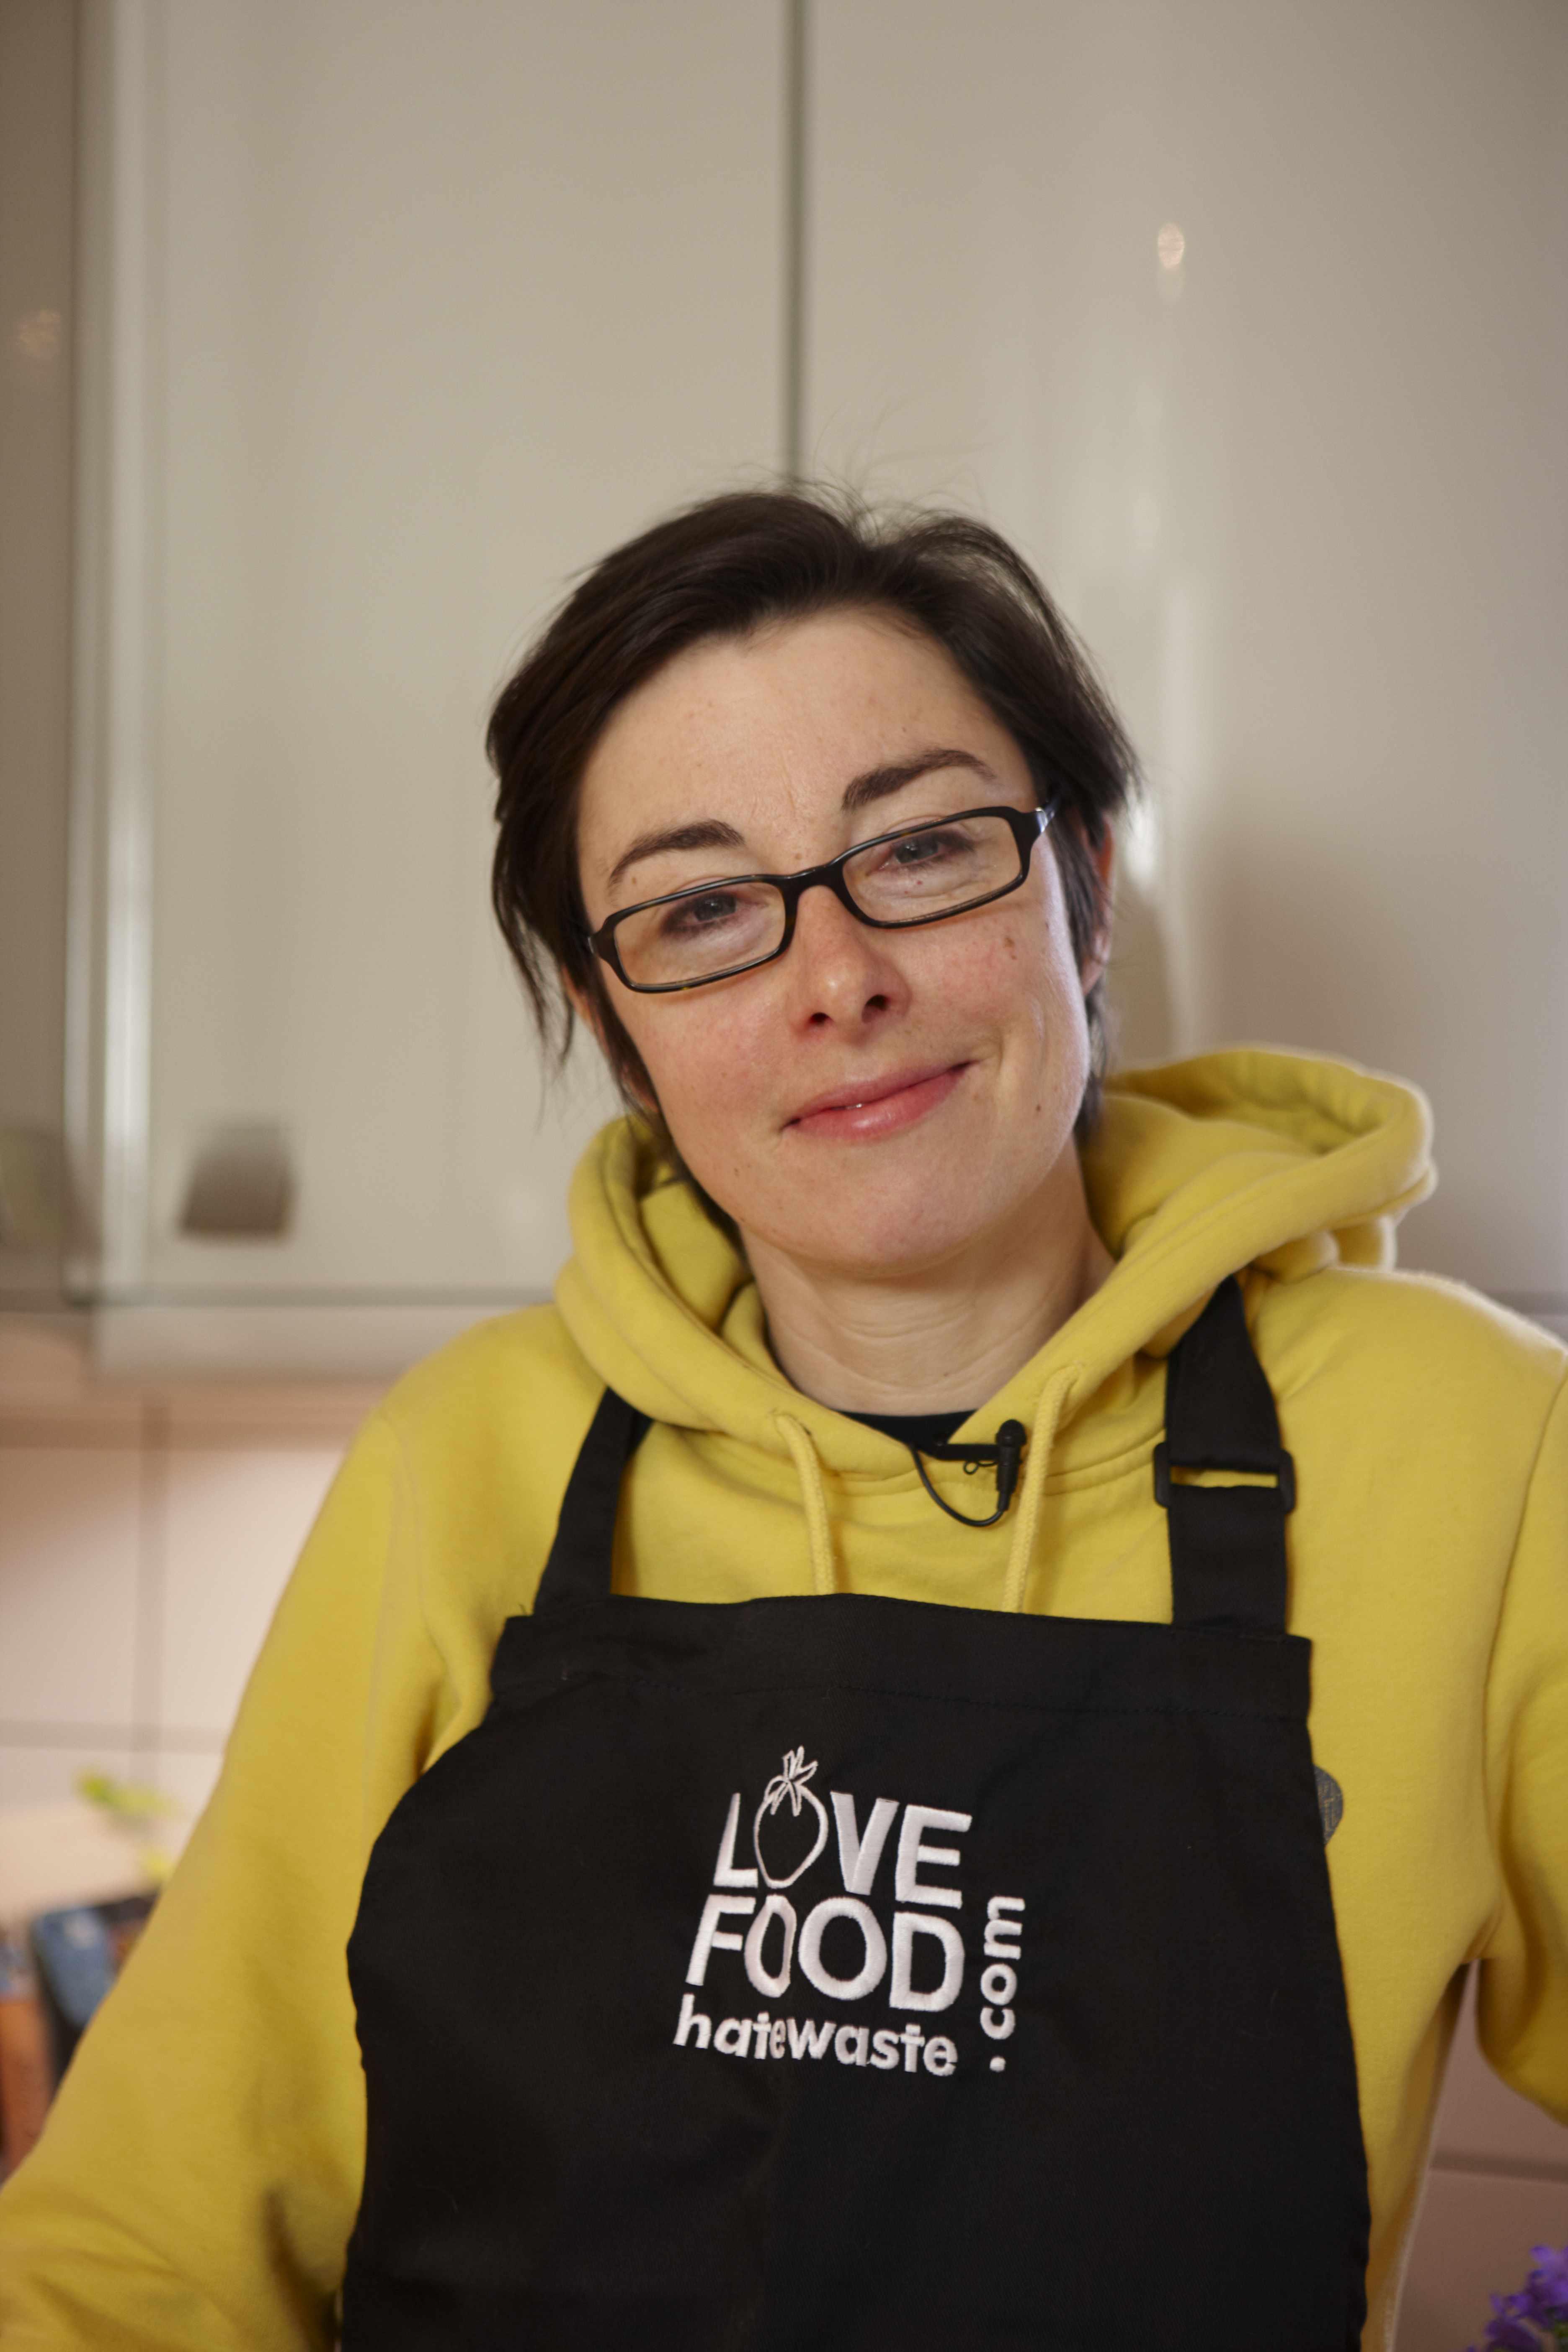 Sue Perkins - BBC celebrity presenter | Interior Architectural Photography